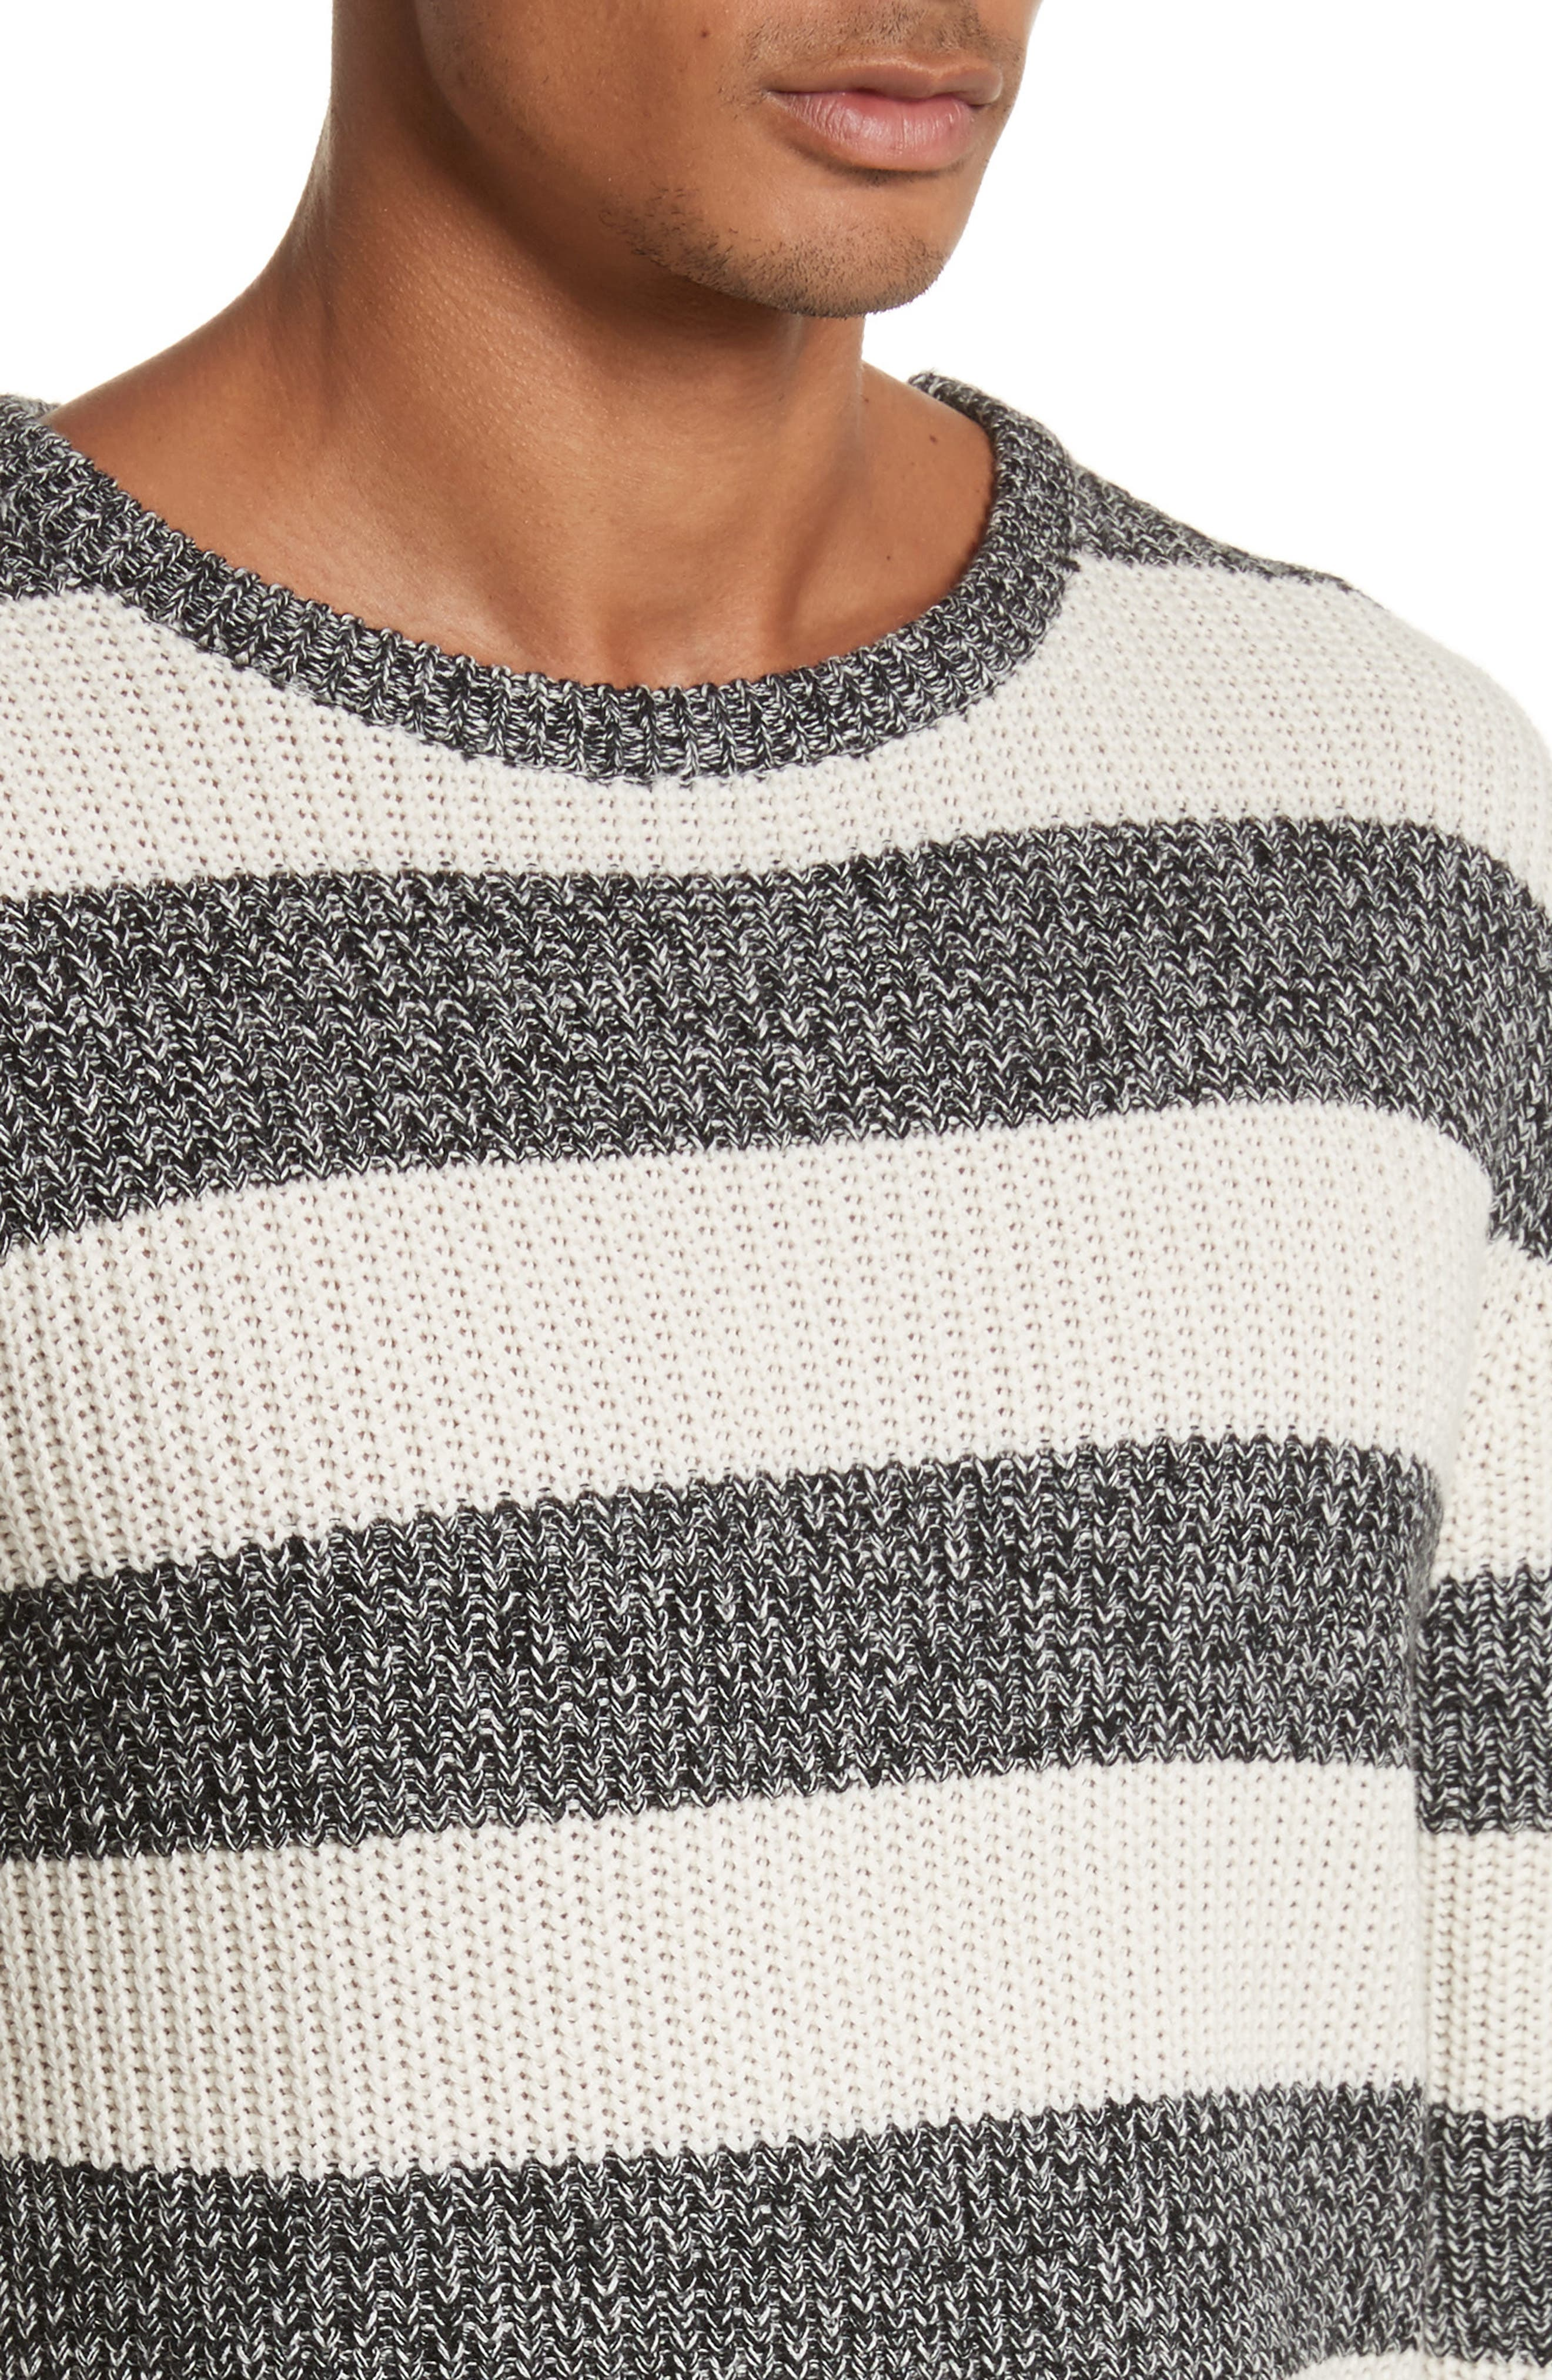 Lee Stripe Crewneck Sweater,                             Alternate thumbnail 4, color,                             101